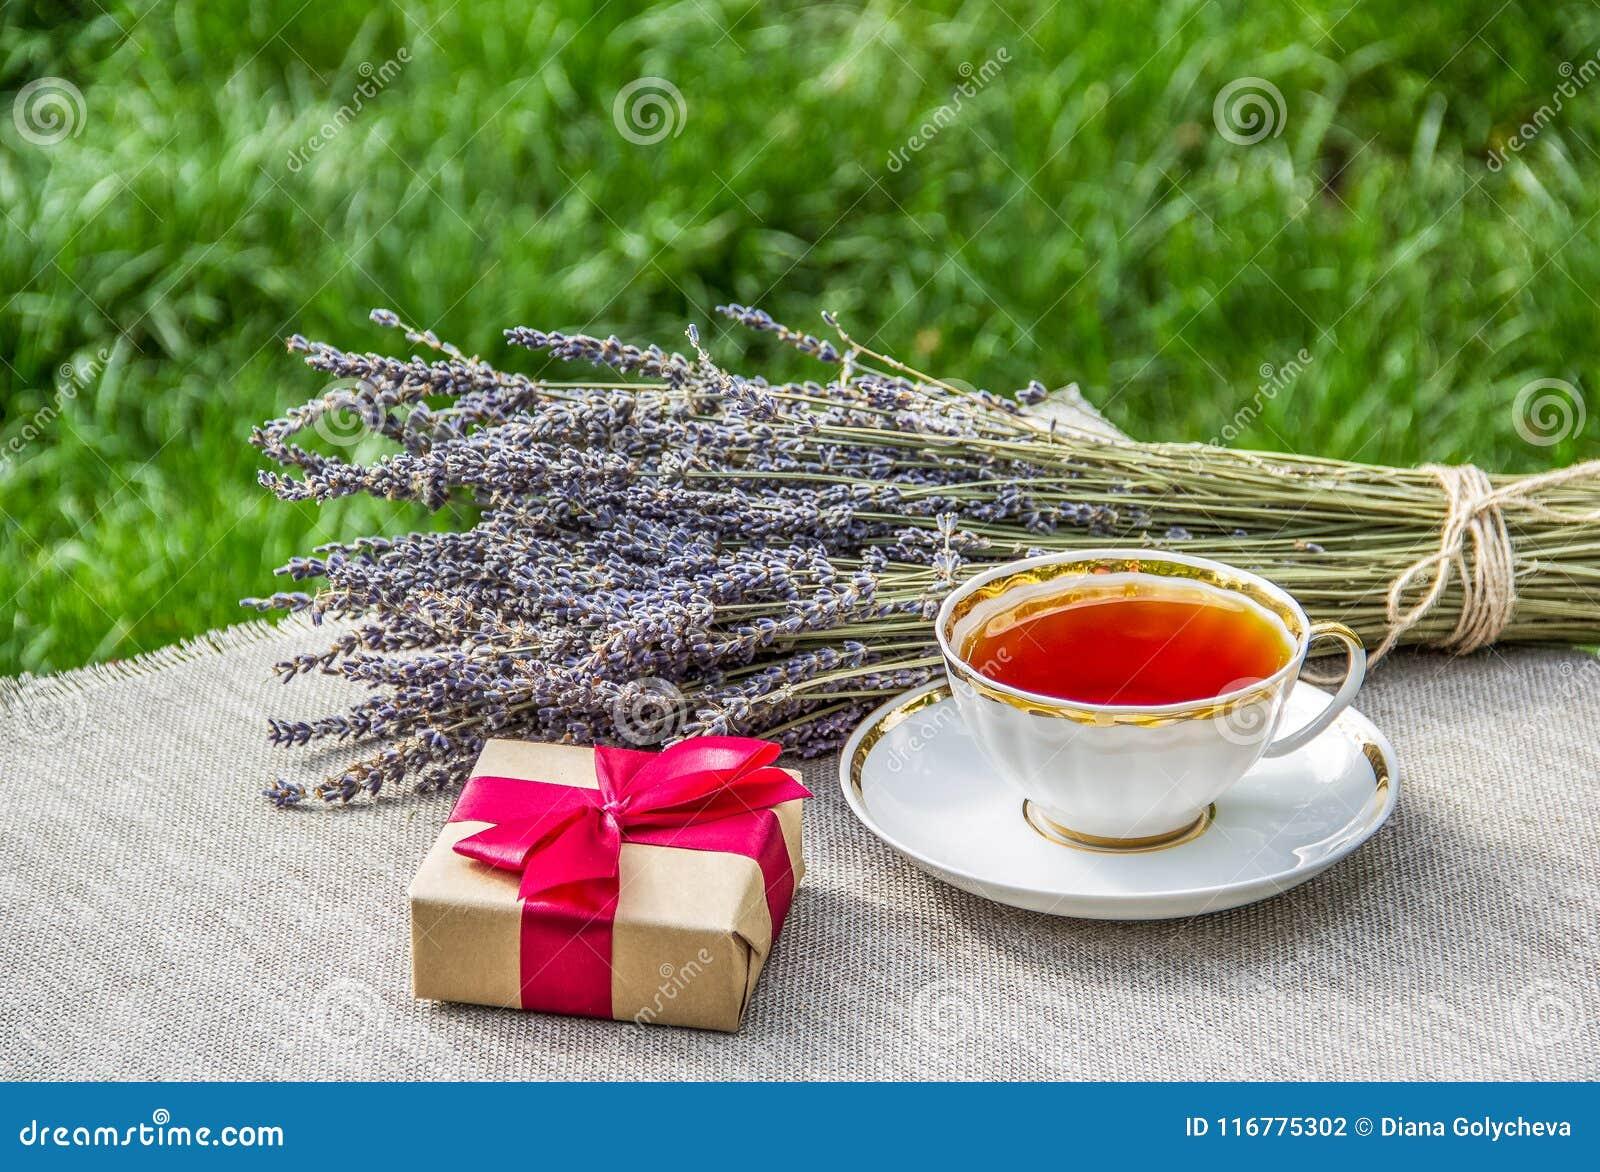 Is tea useful? 37